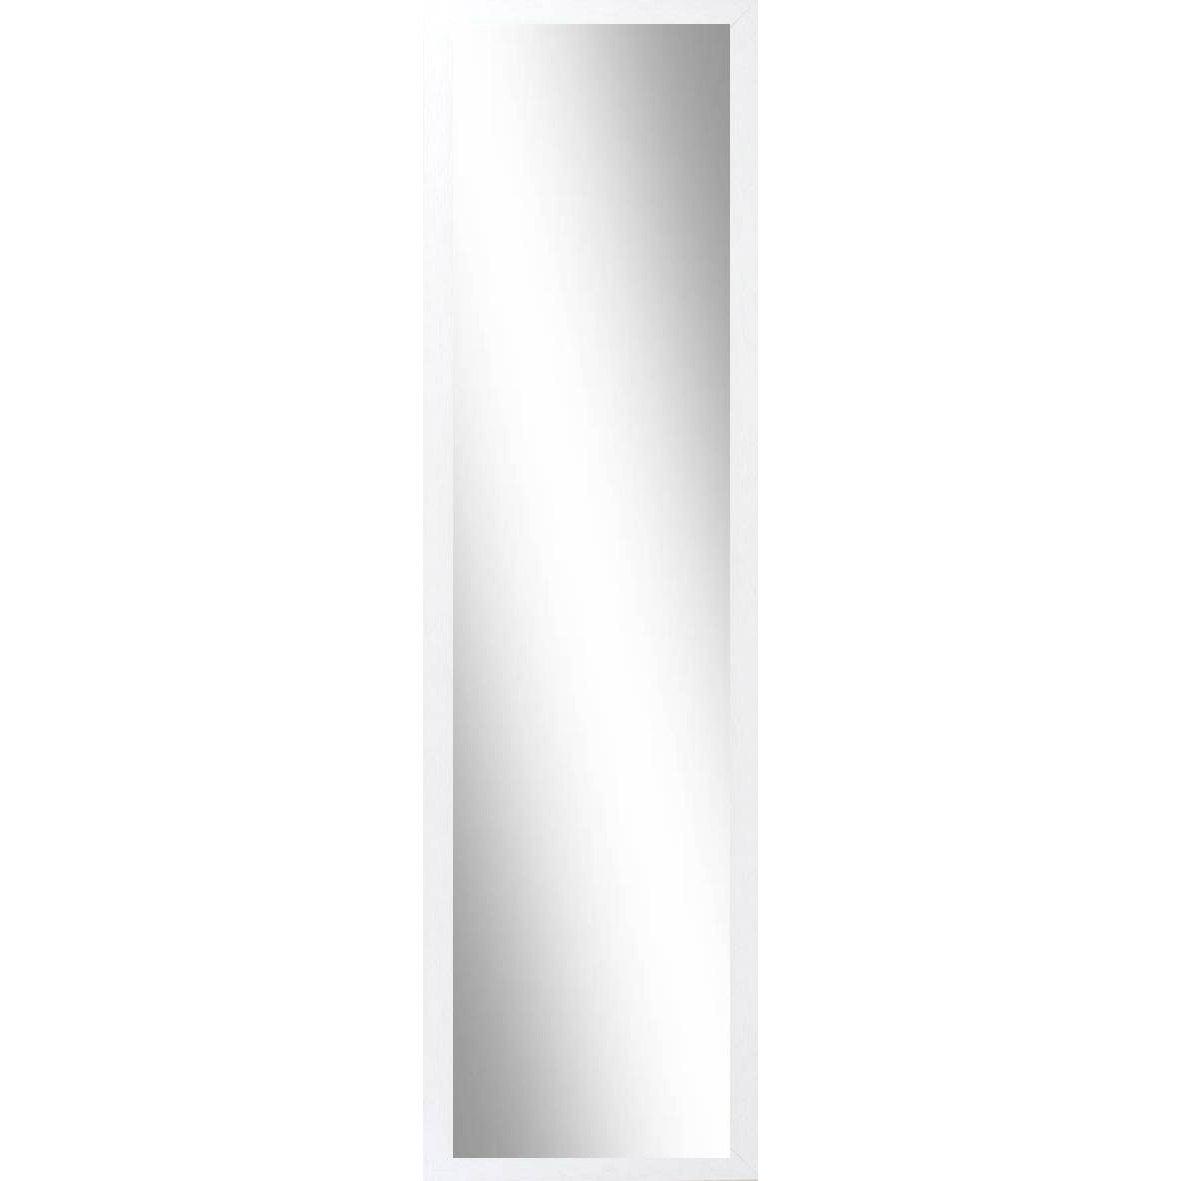 Miroir riviera inspire blanc x cm leroy merlin for Miroir rectangulaire 120 cm